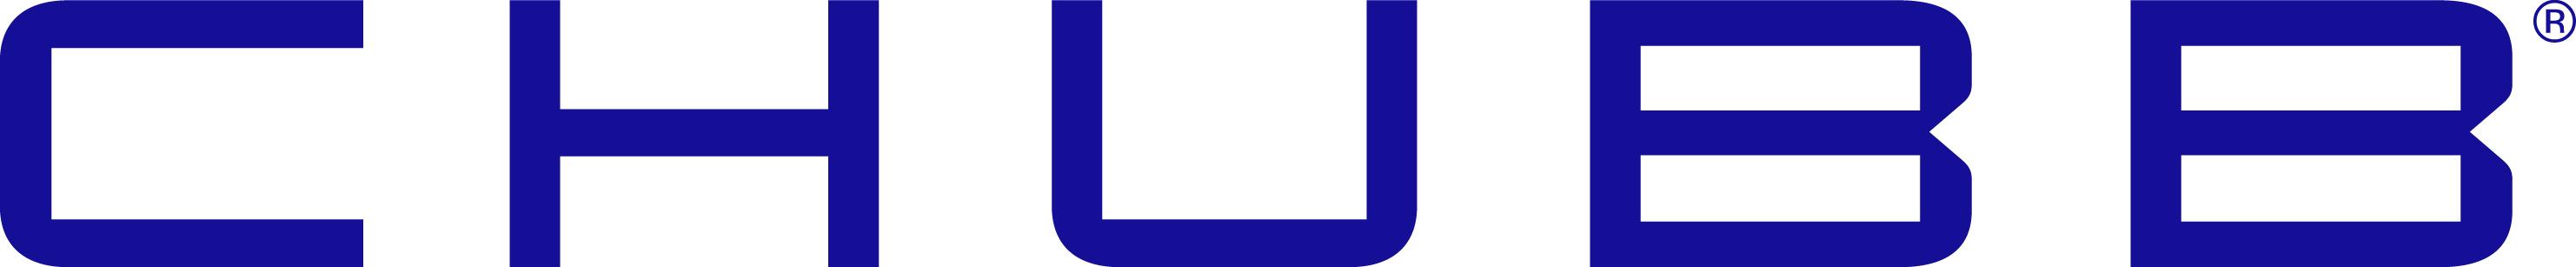 Chubb logo